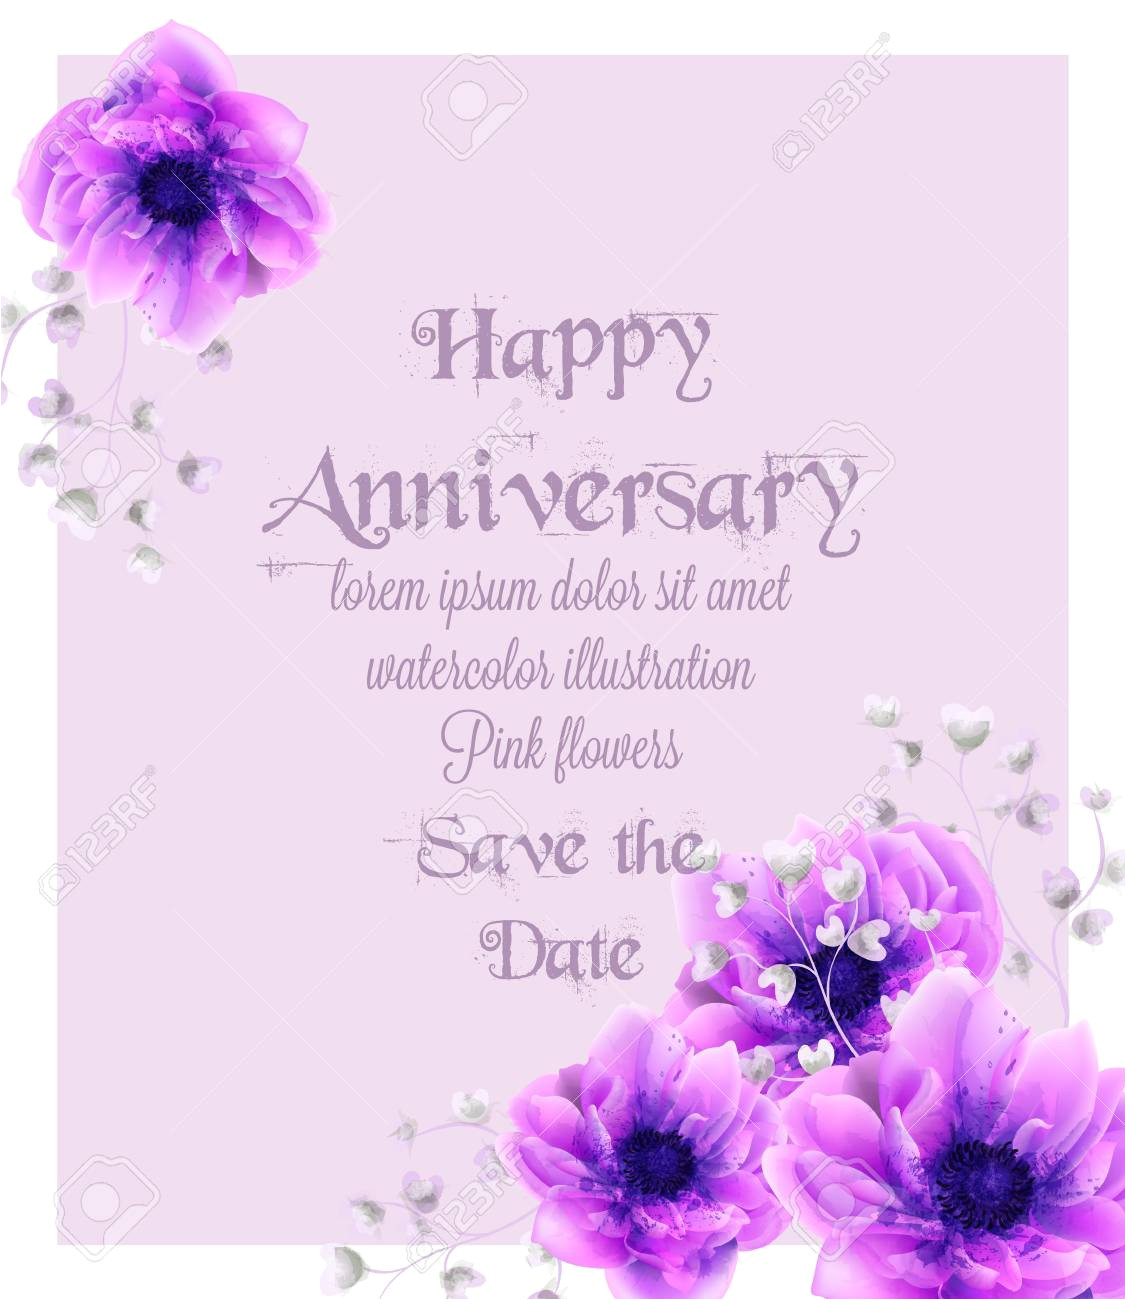 114412050 happy anniversary card with pink flowers watercolor vector beautiful vintage pastel colors floral de jpg